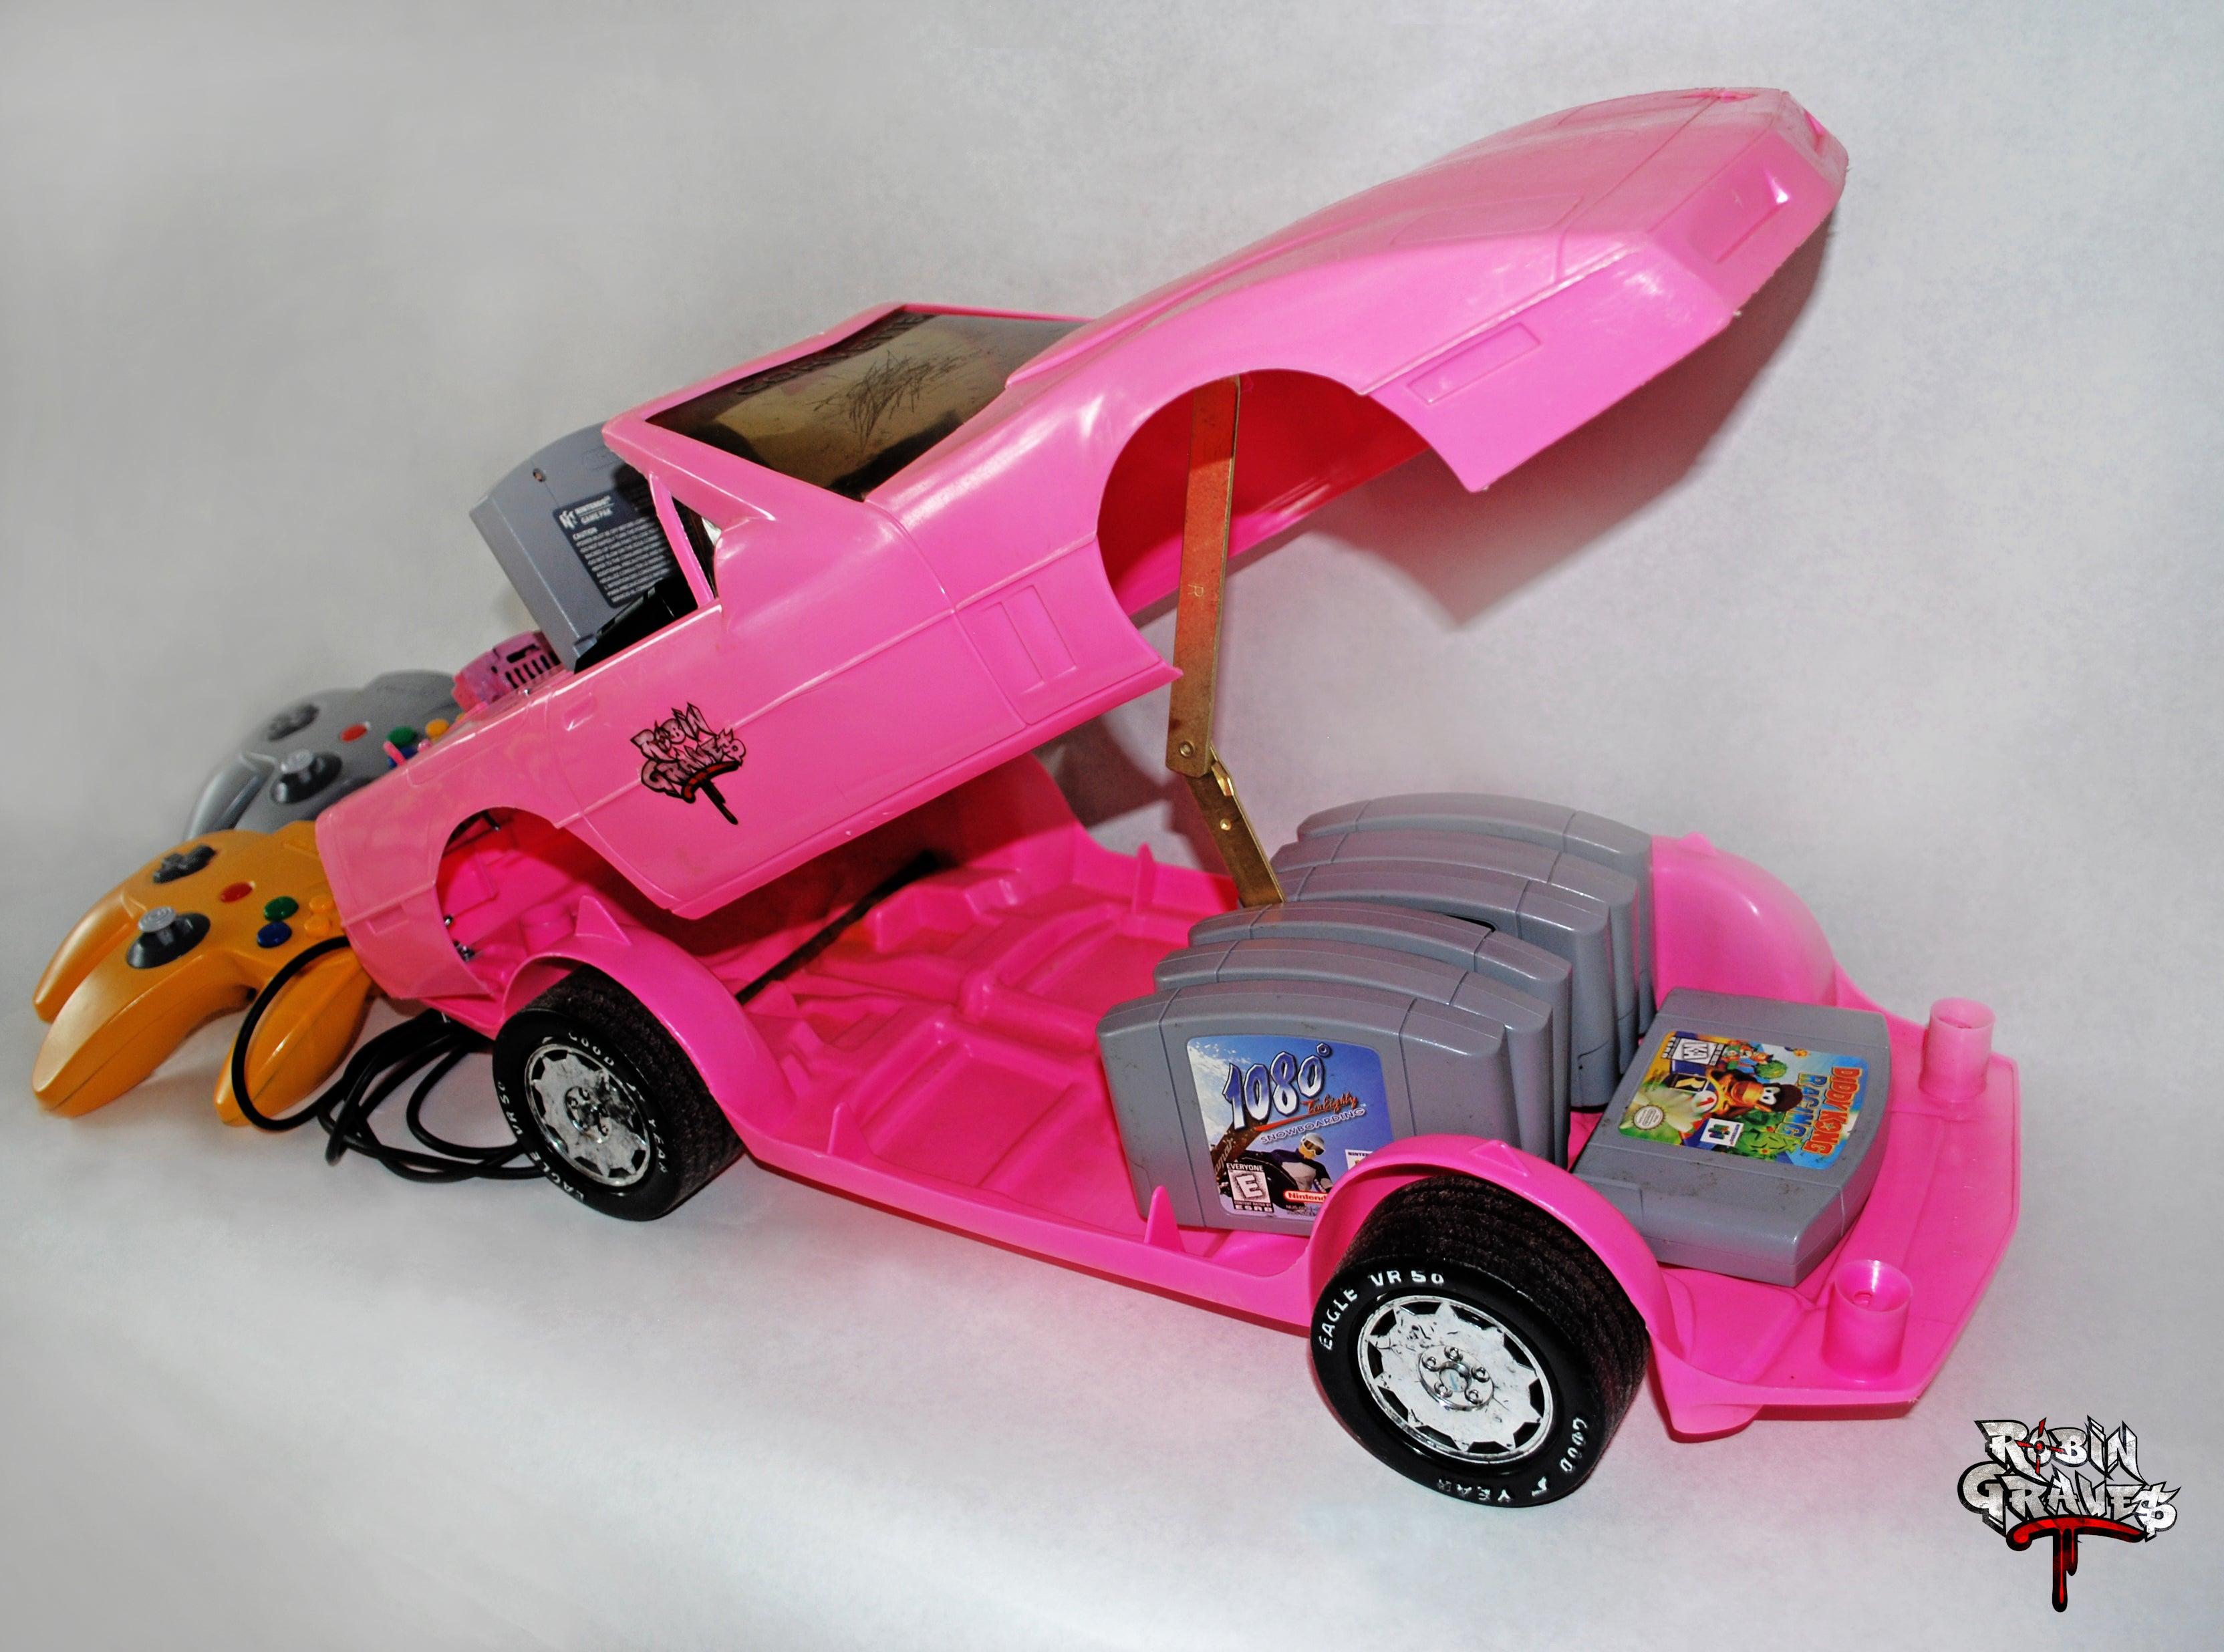 Guy Turns Nintendo 64 Into Hot Pink Barbie Corvette